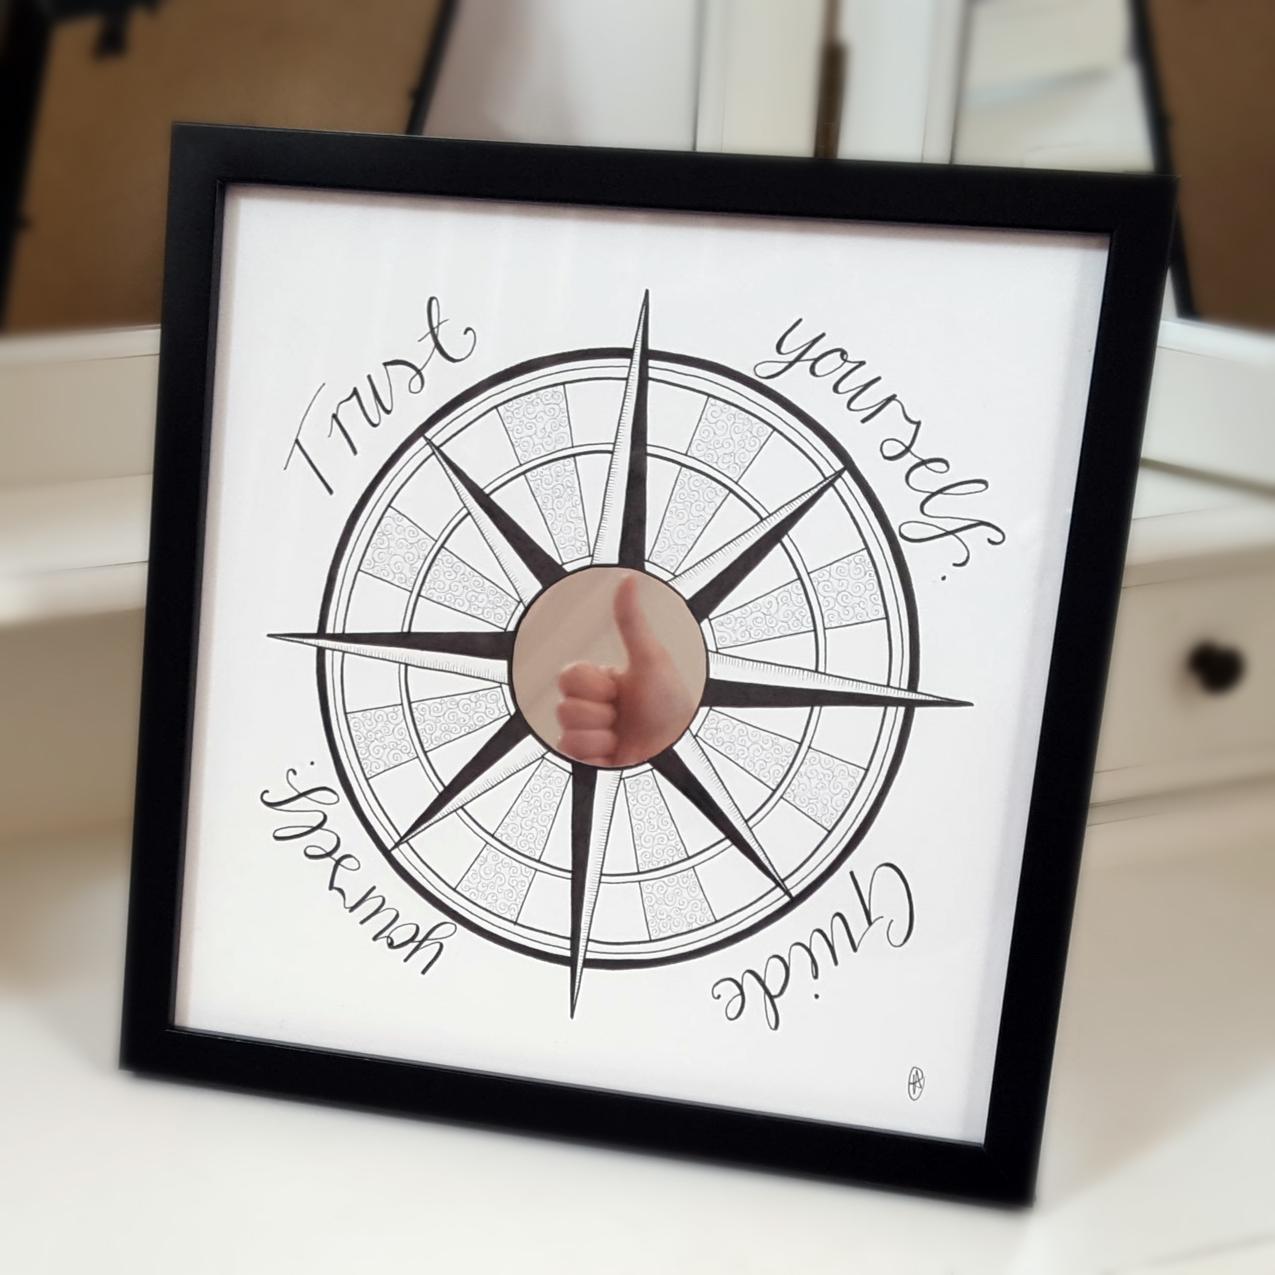 trust-yourself-compass-artwork.jpg